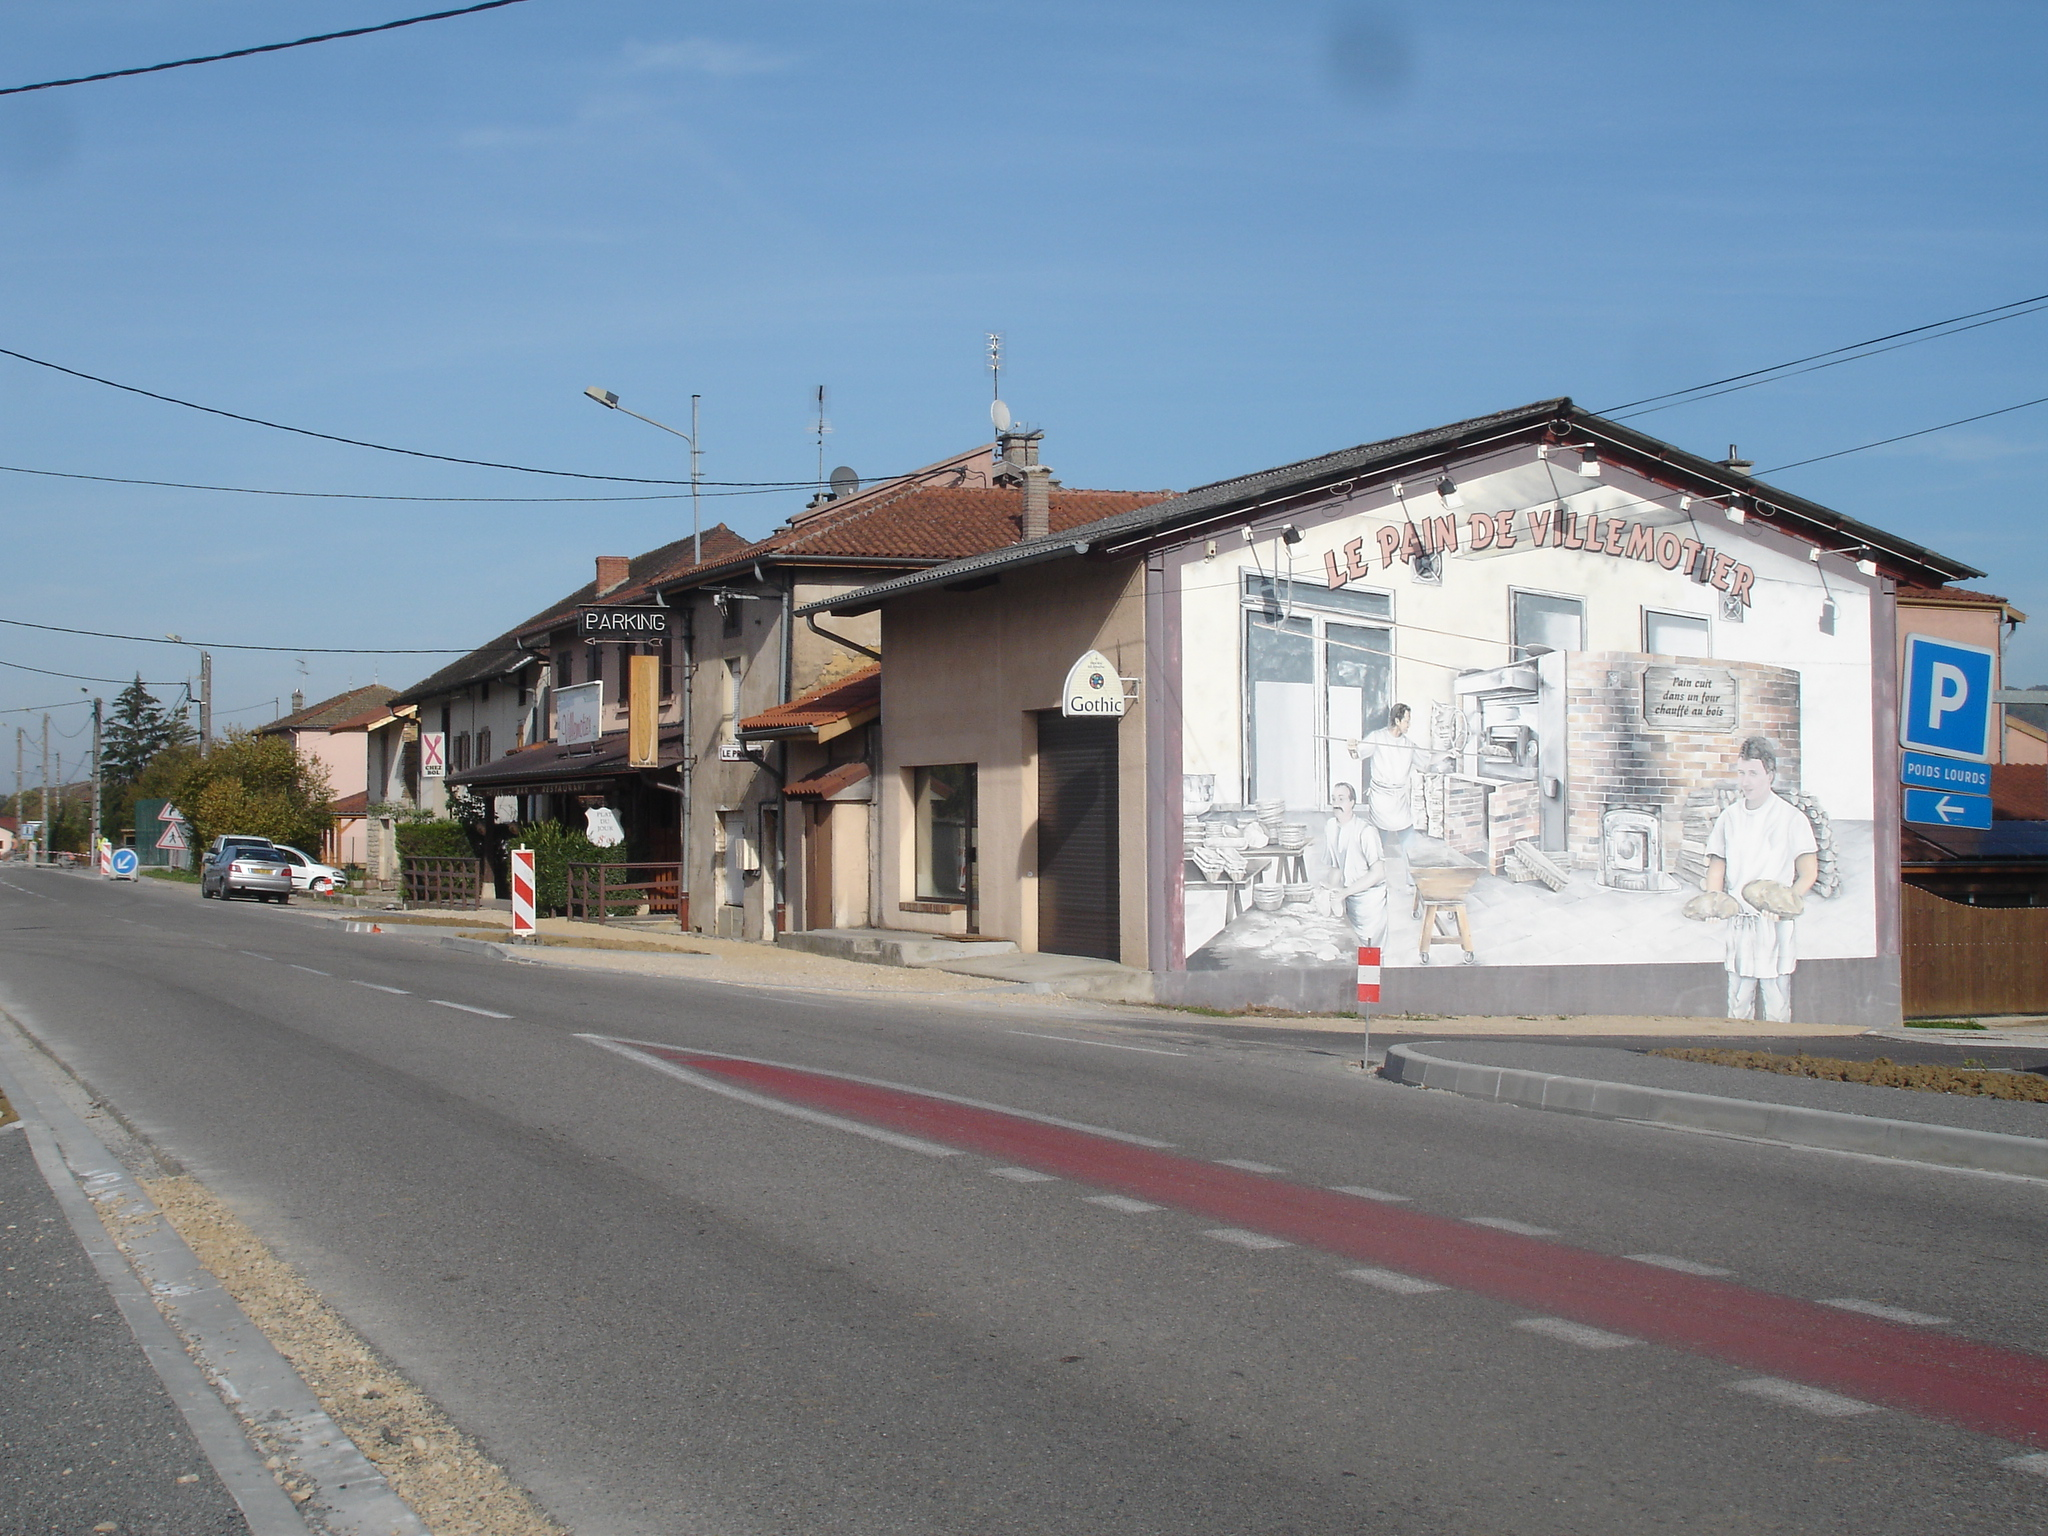 Villemotier